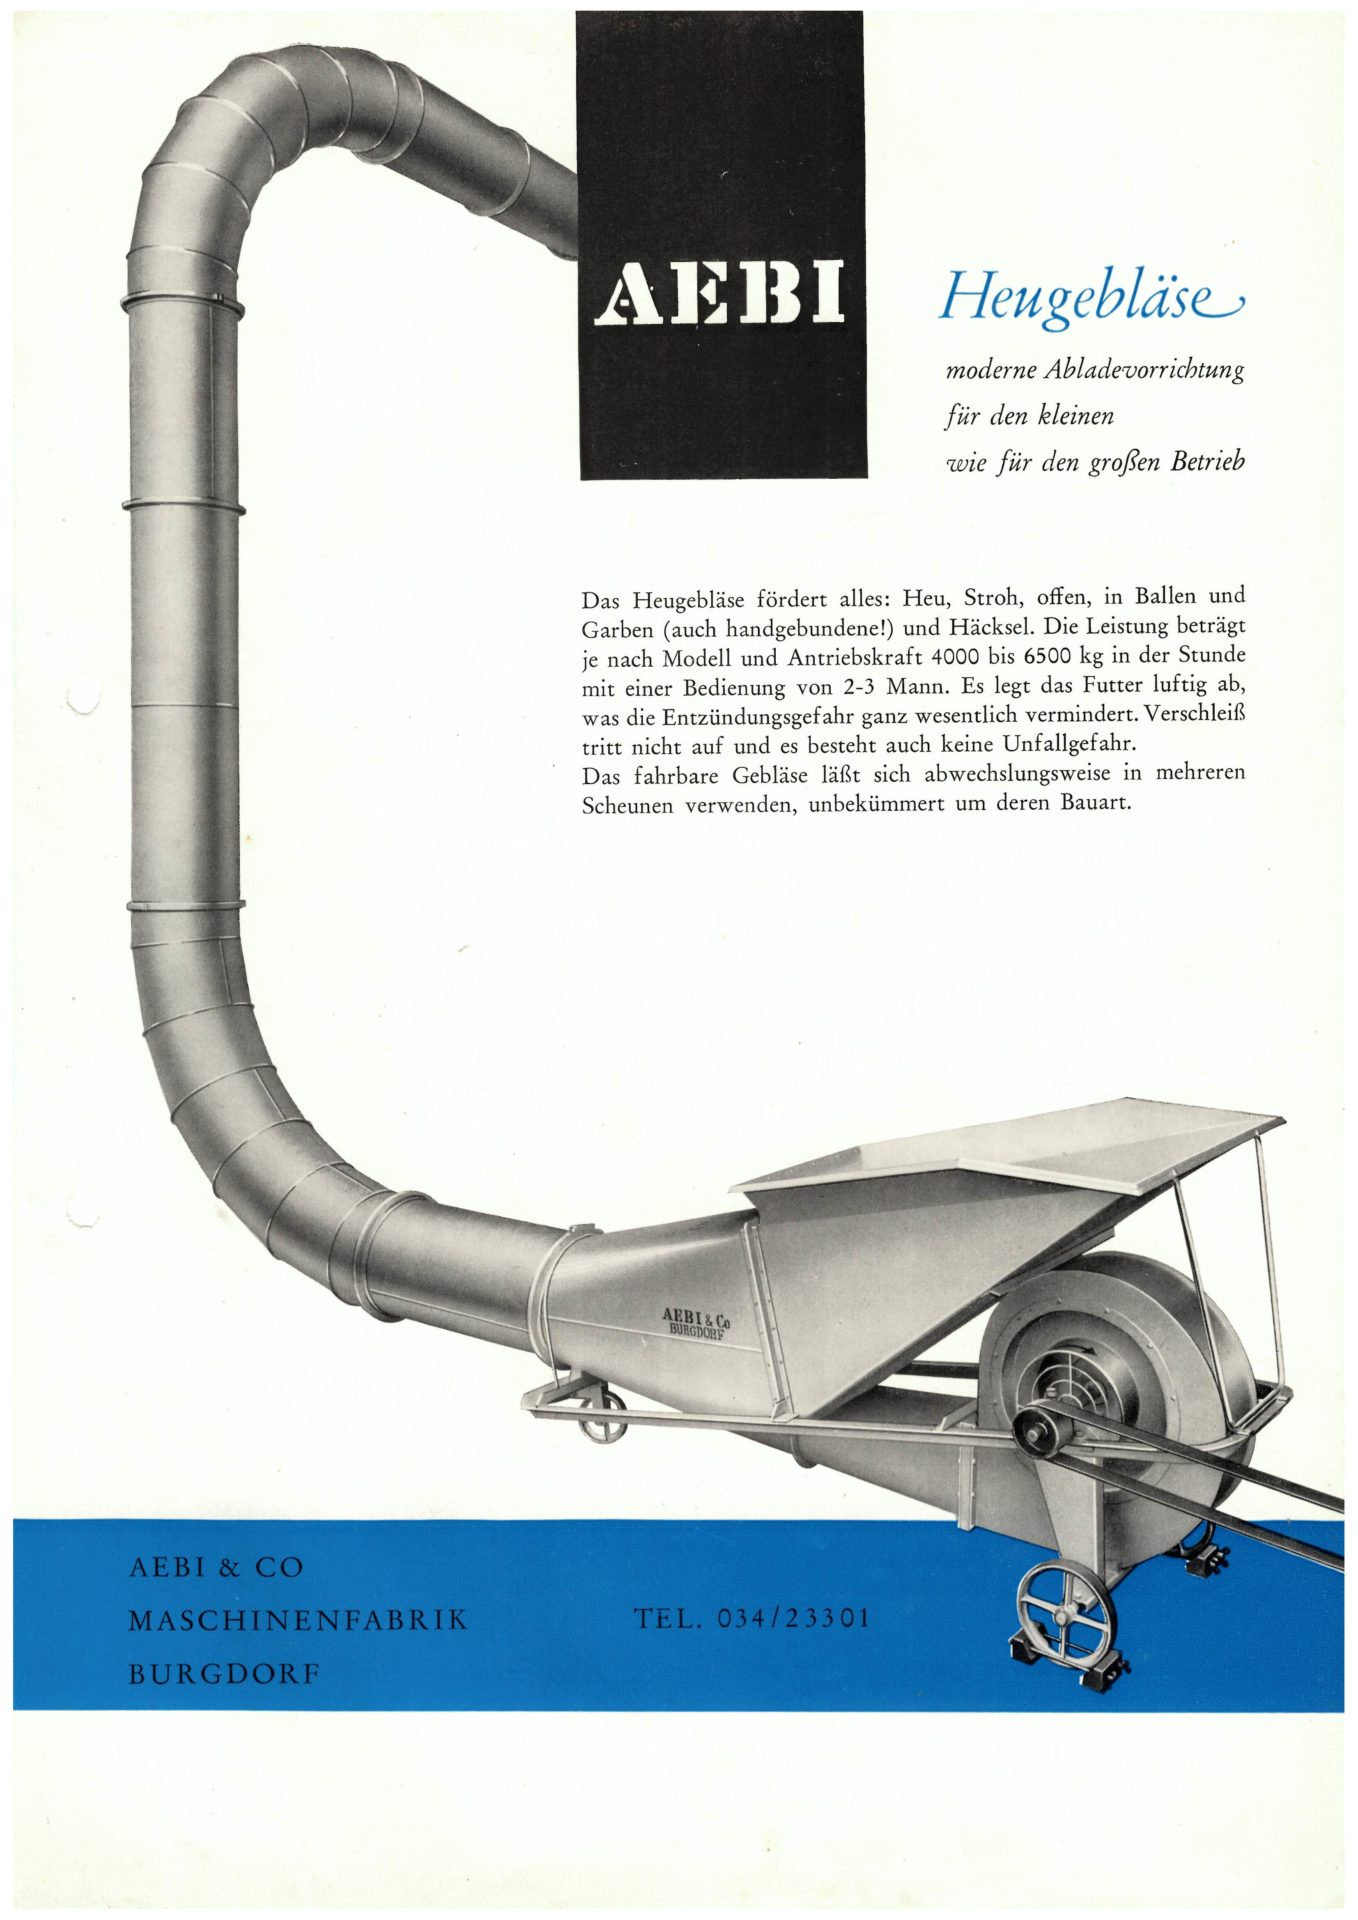 Image result for aebi-heugeblaese-a